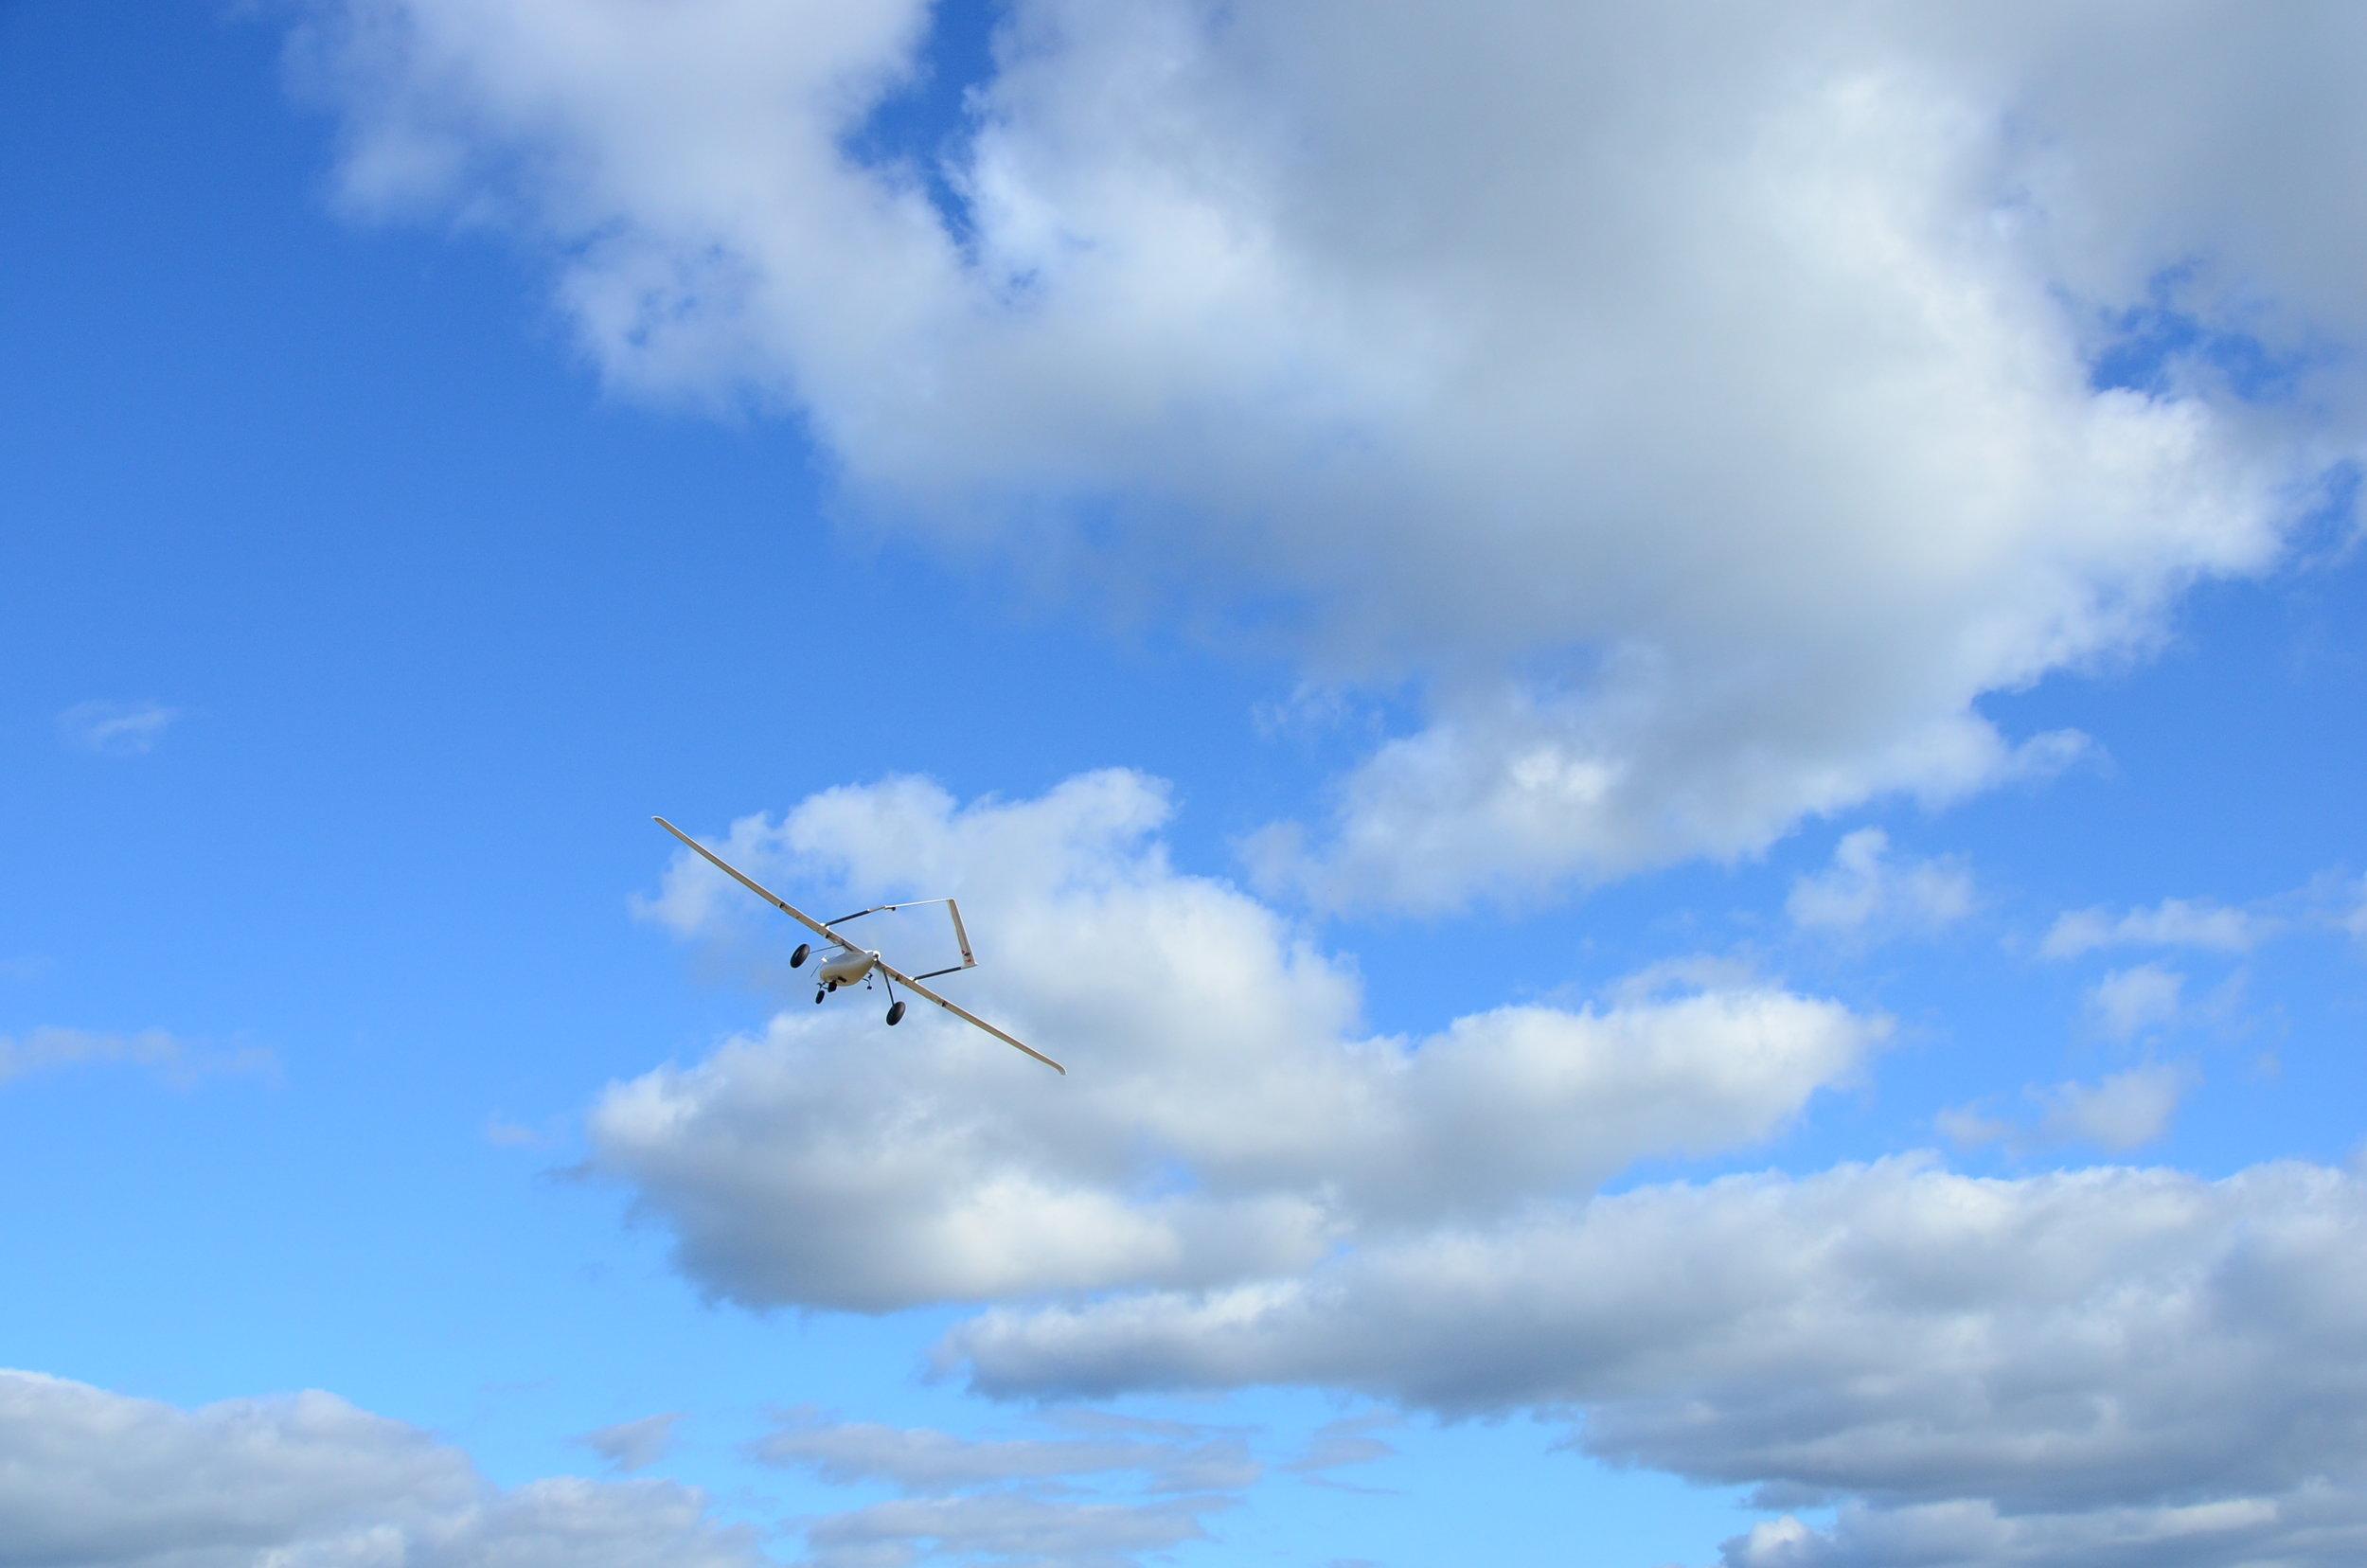 Albatross_UAV_Applied_Aeronautics.jpg